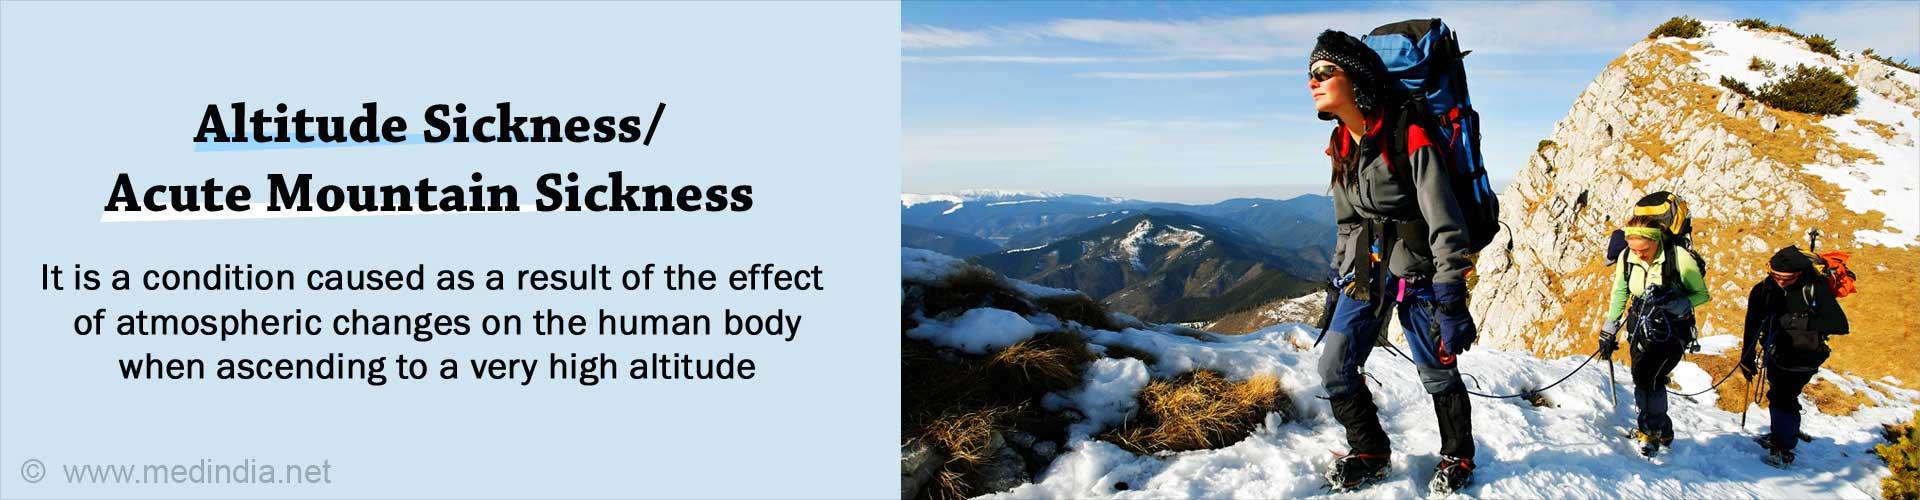 Altitude Sickness - Causes, Symptoms, Signs, Diagnosis, Treatment